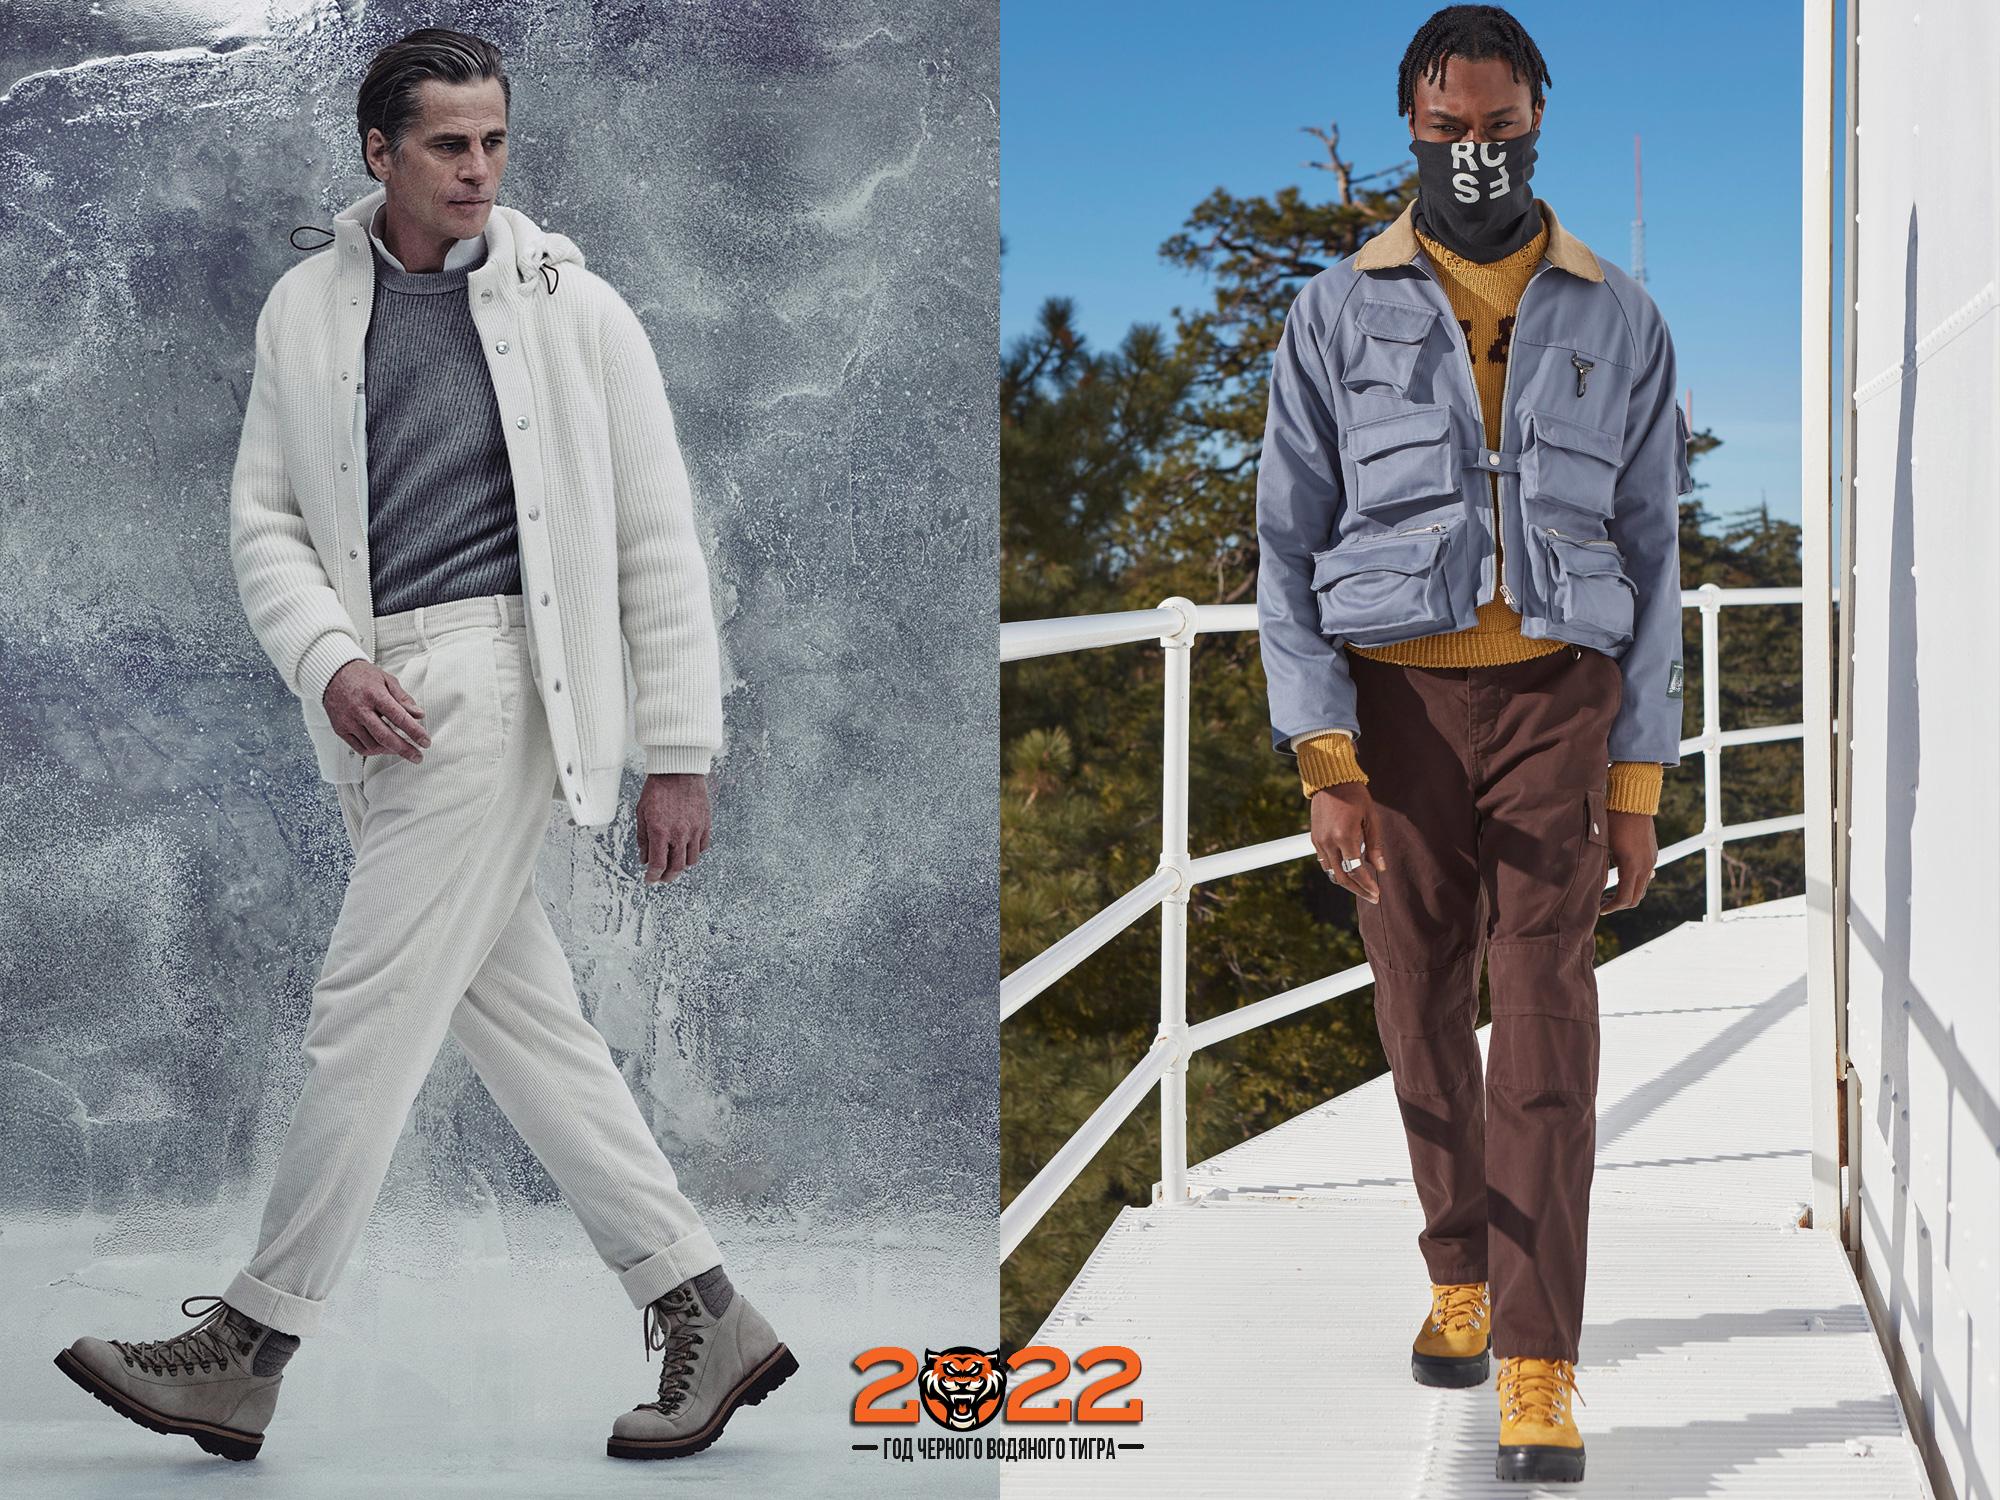 Мужская мода осень-зима 2021-2022 - ботинки на шнуровке